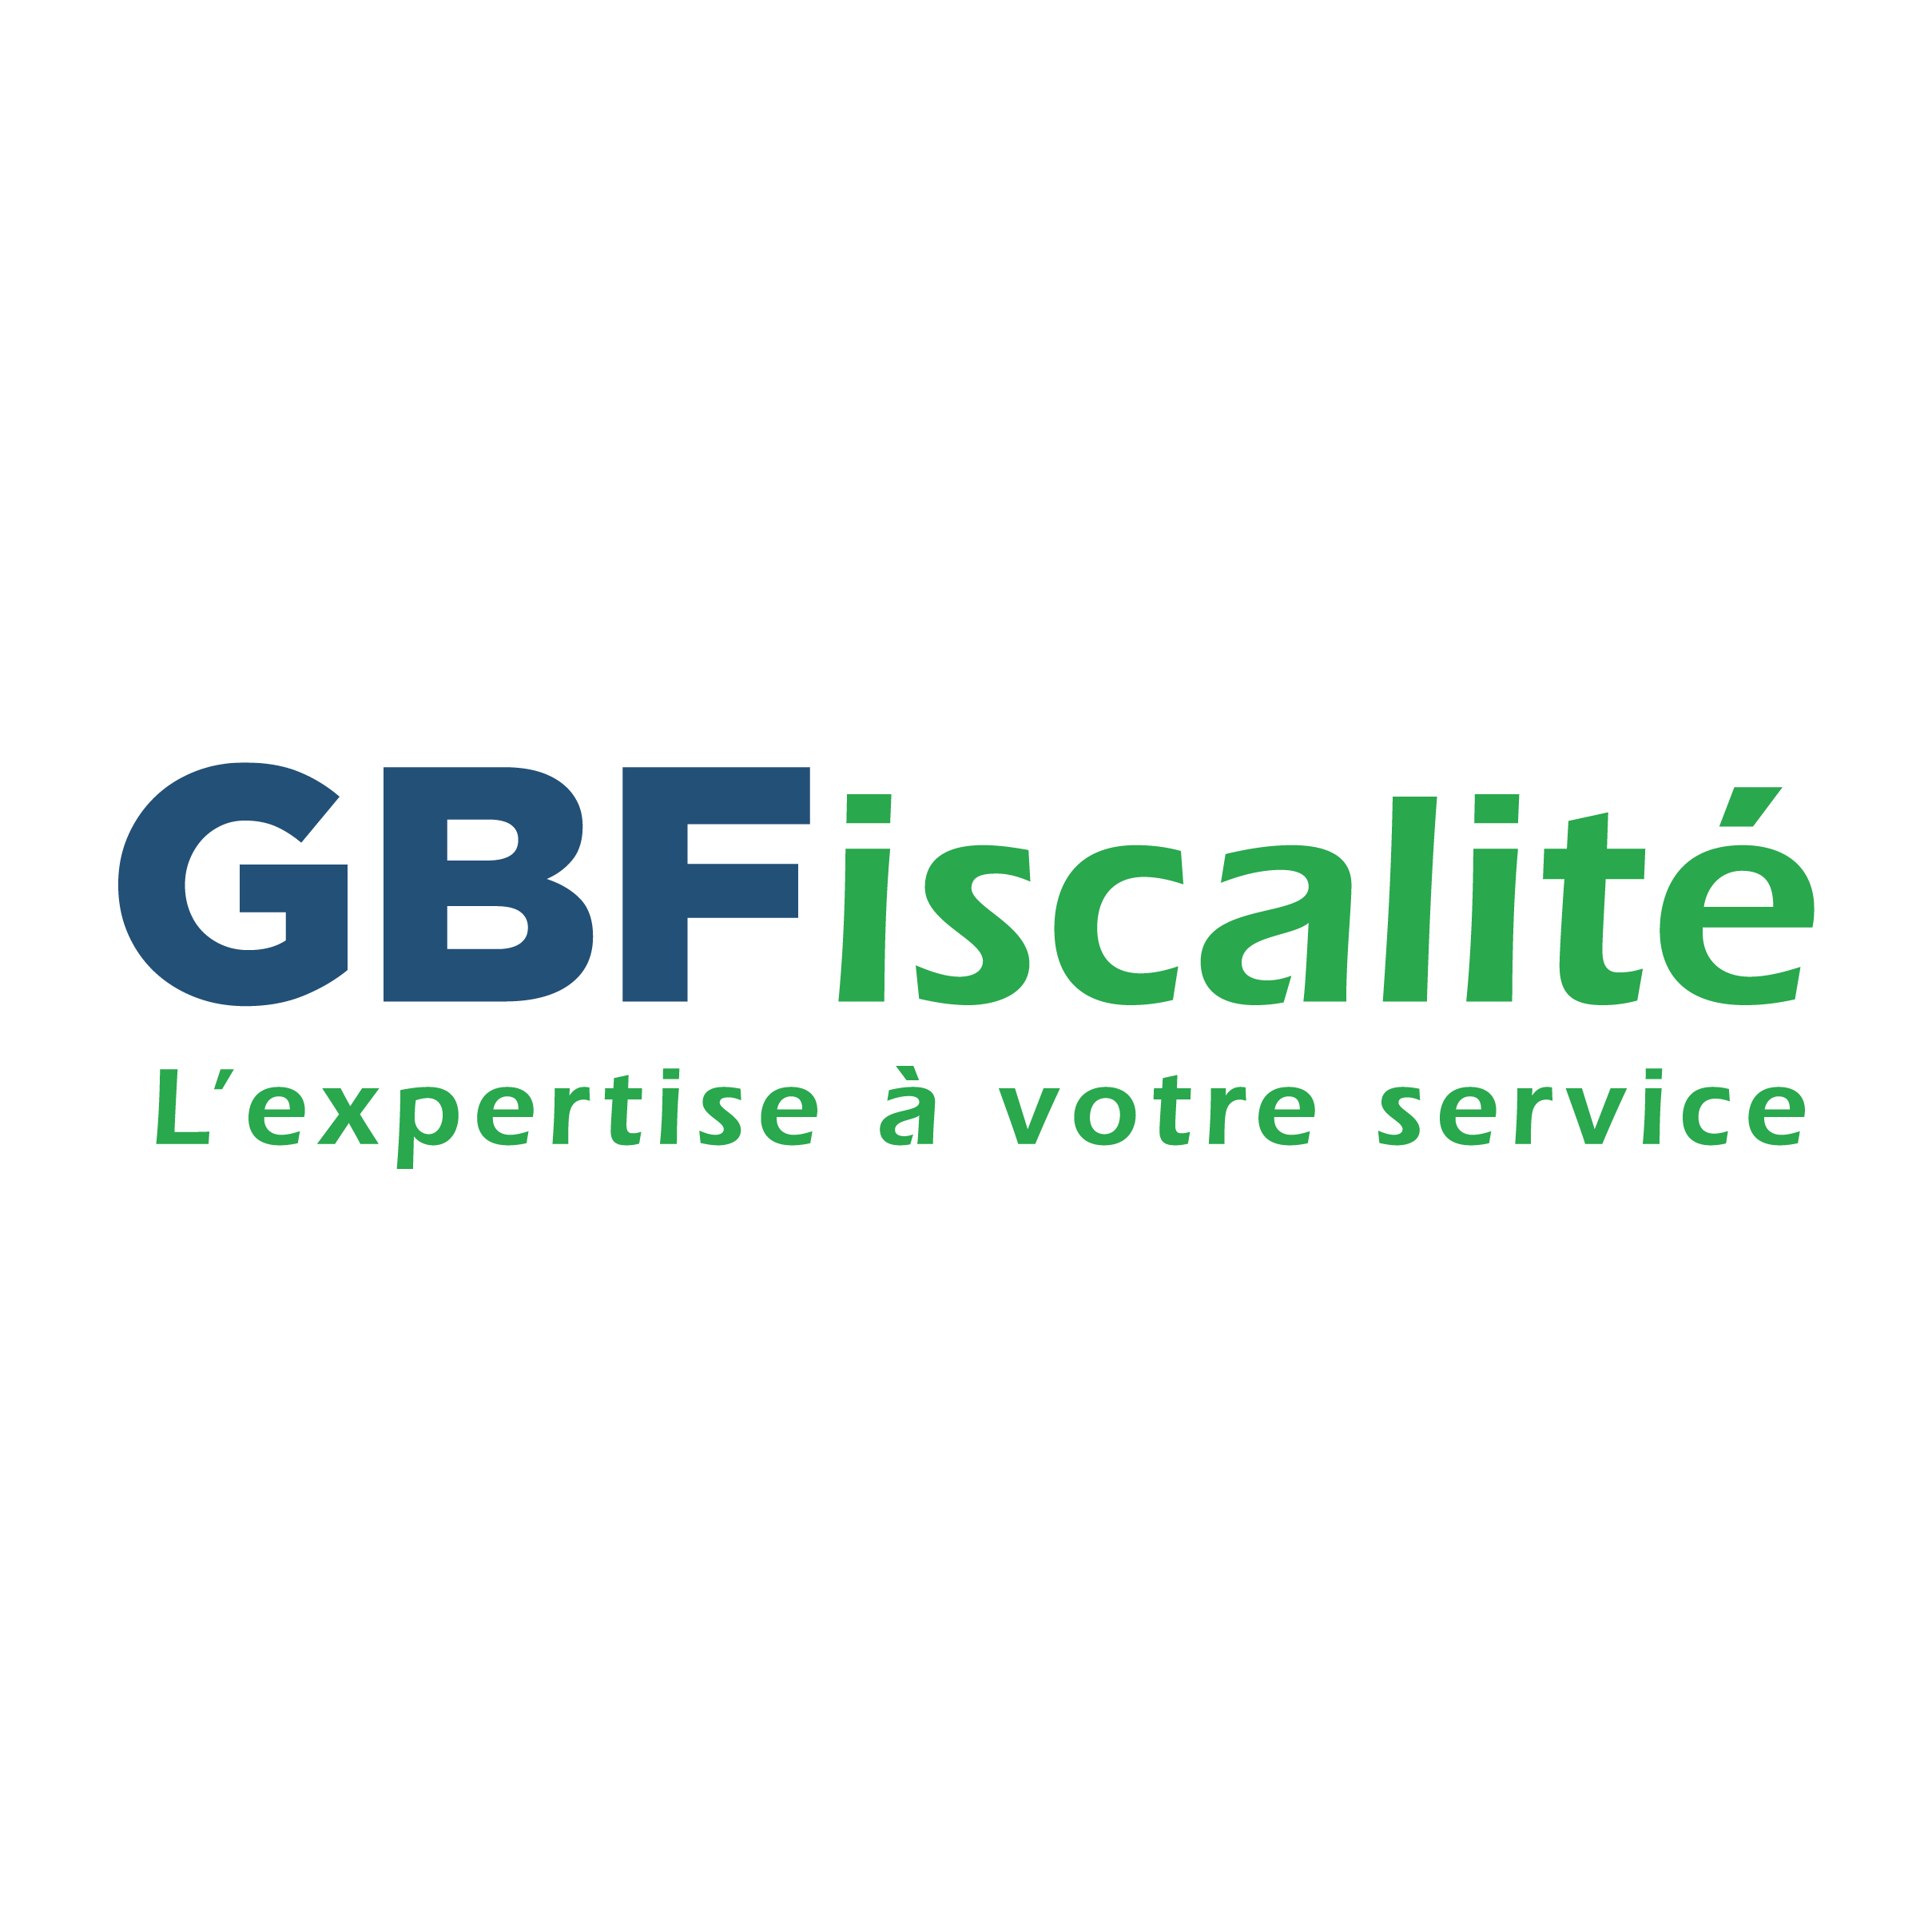 GBFiscalité